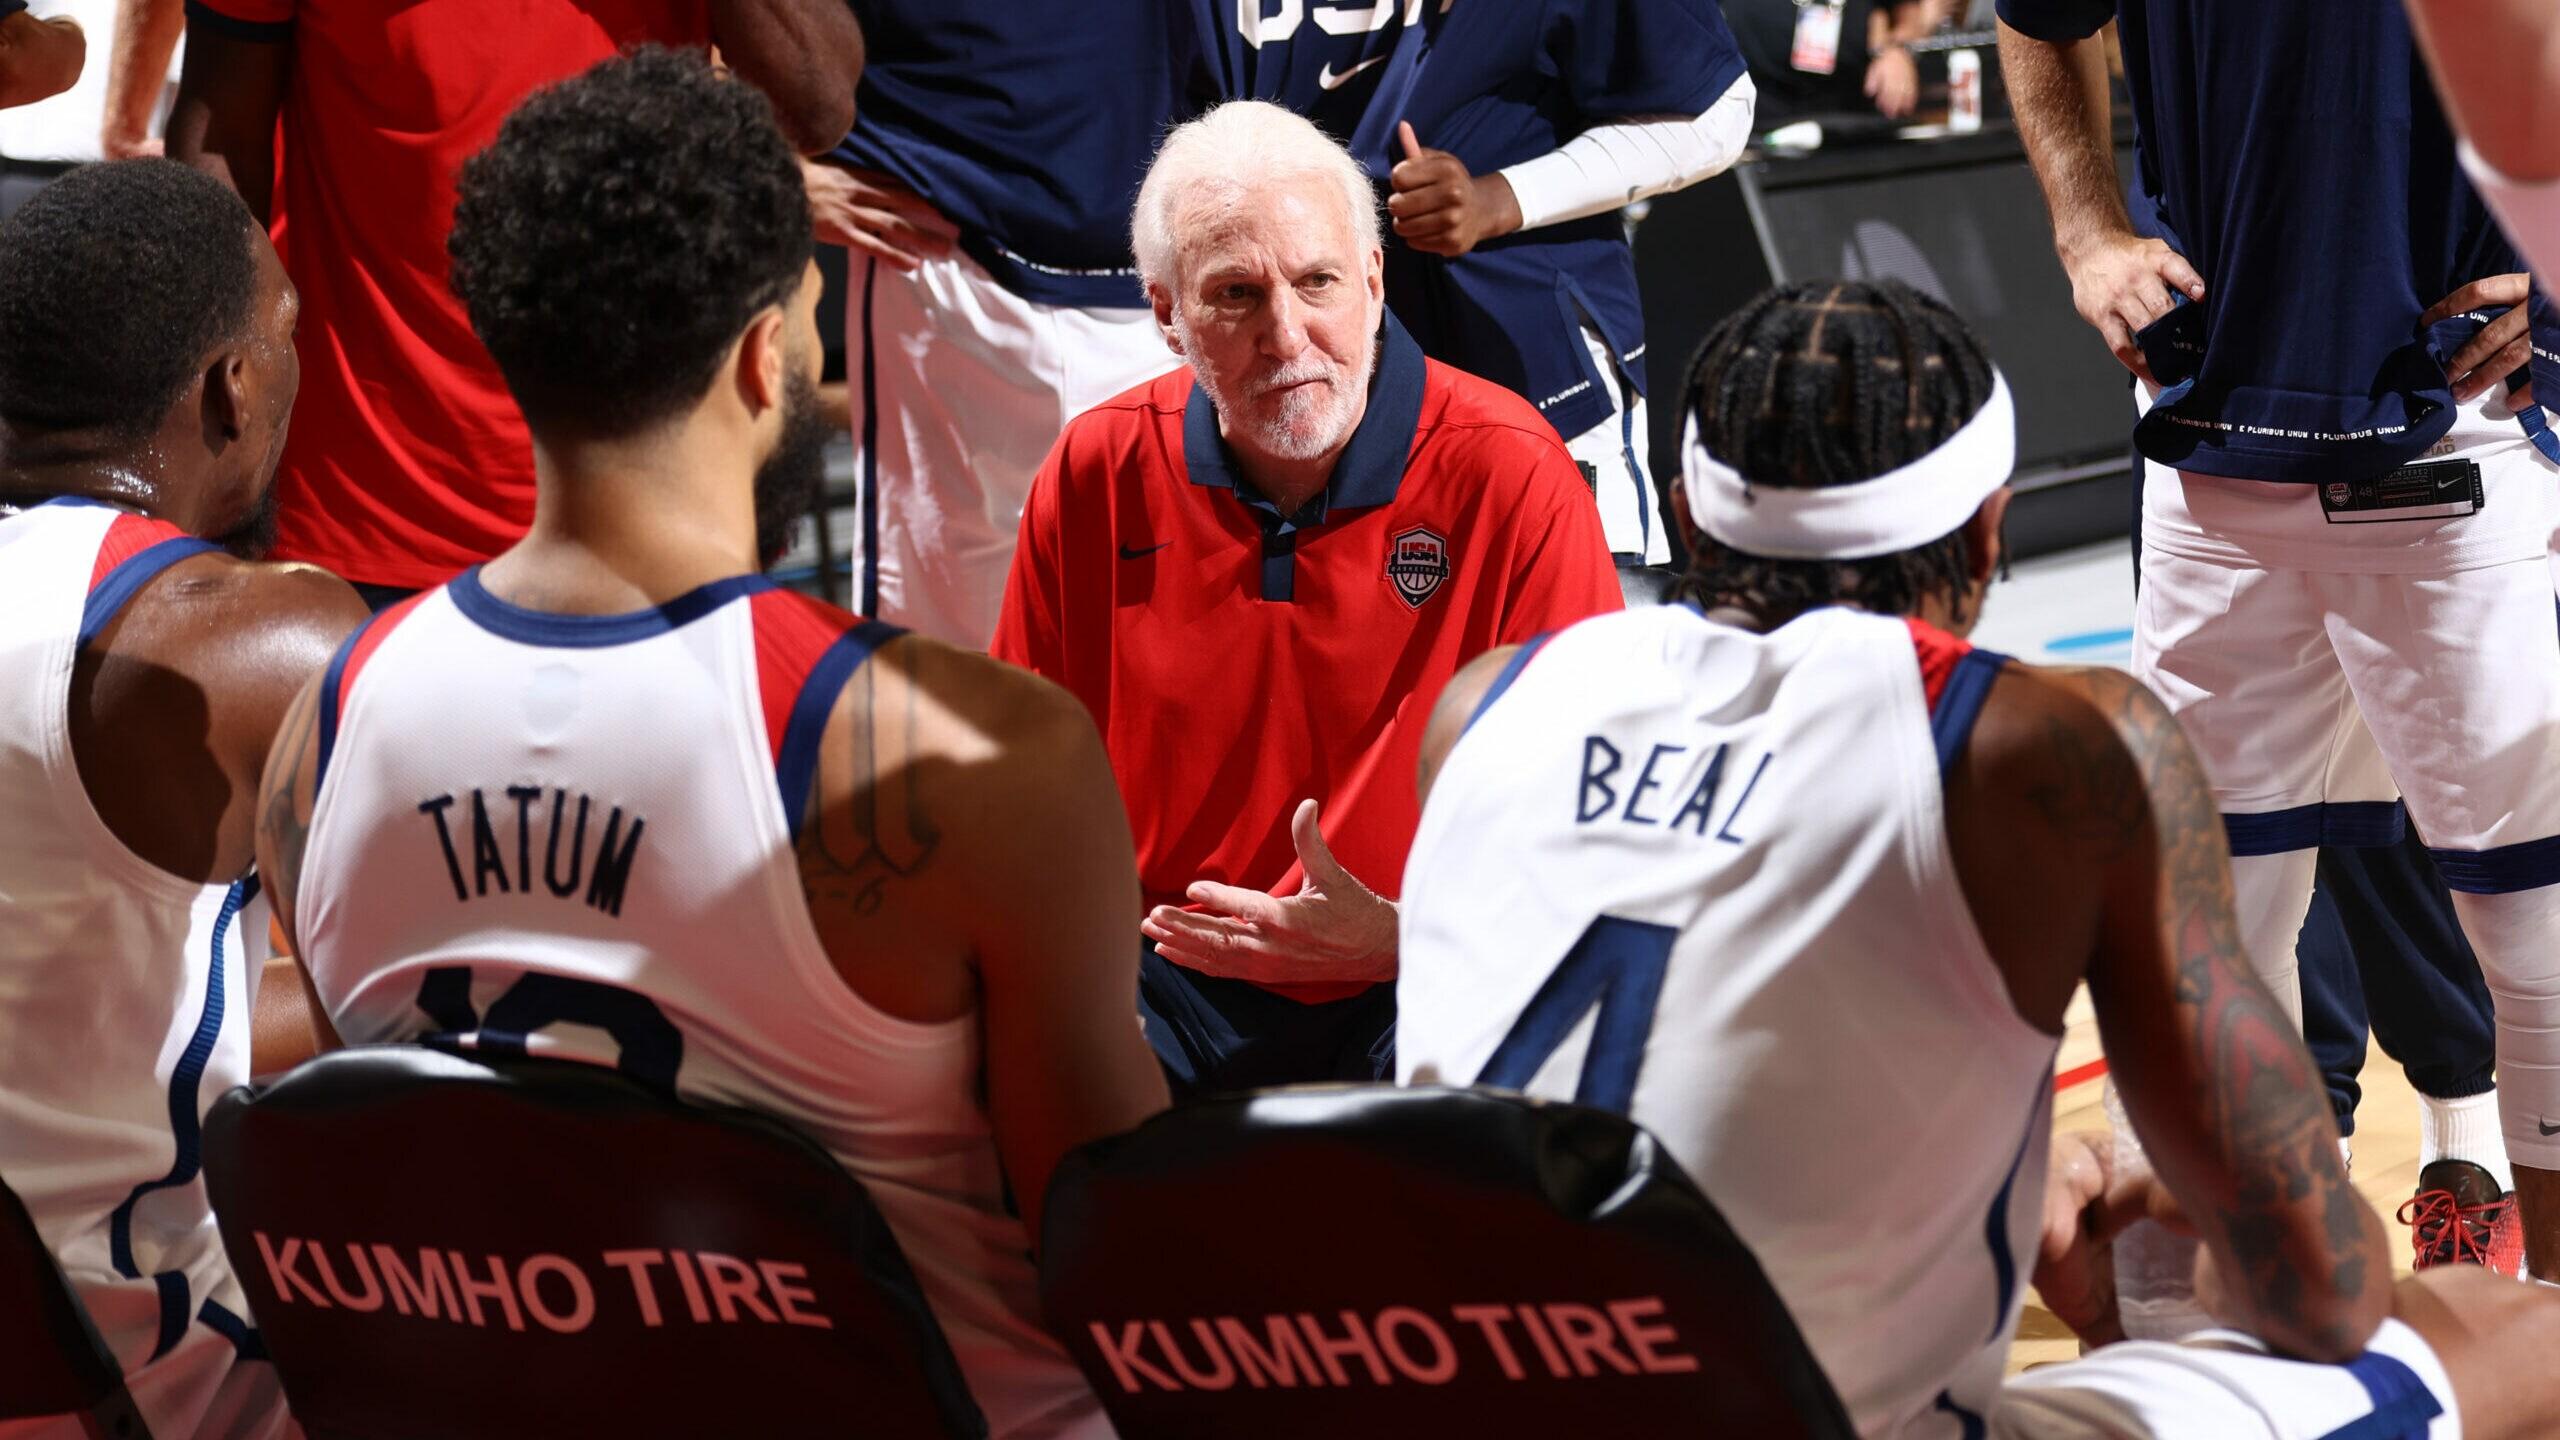 USA Basketball men's national team July 16 exhibition game vs. Australia canceled